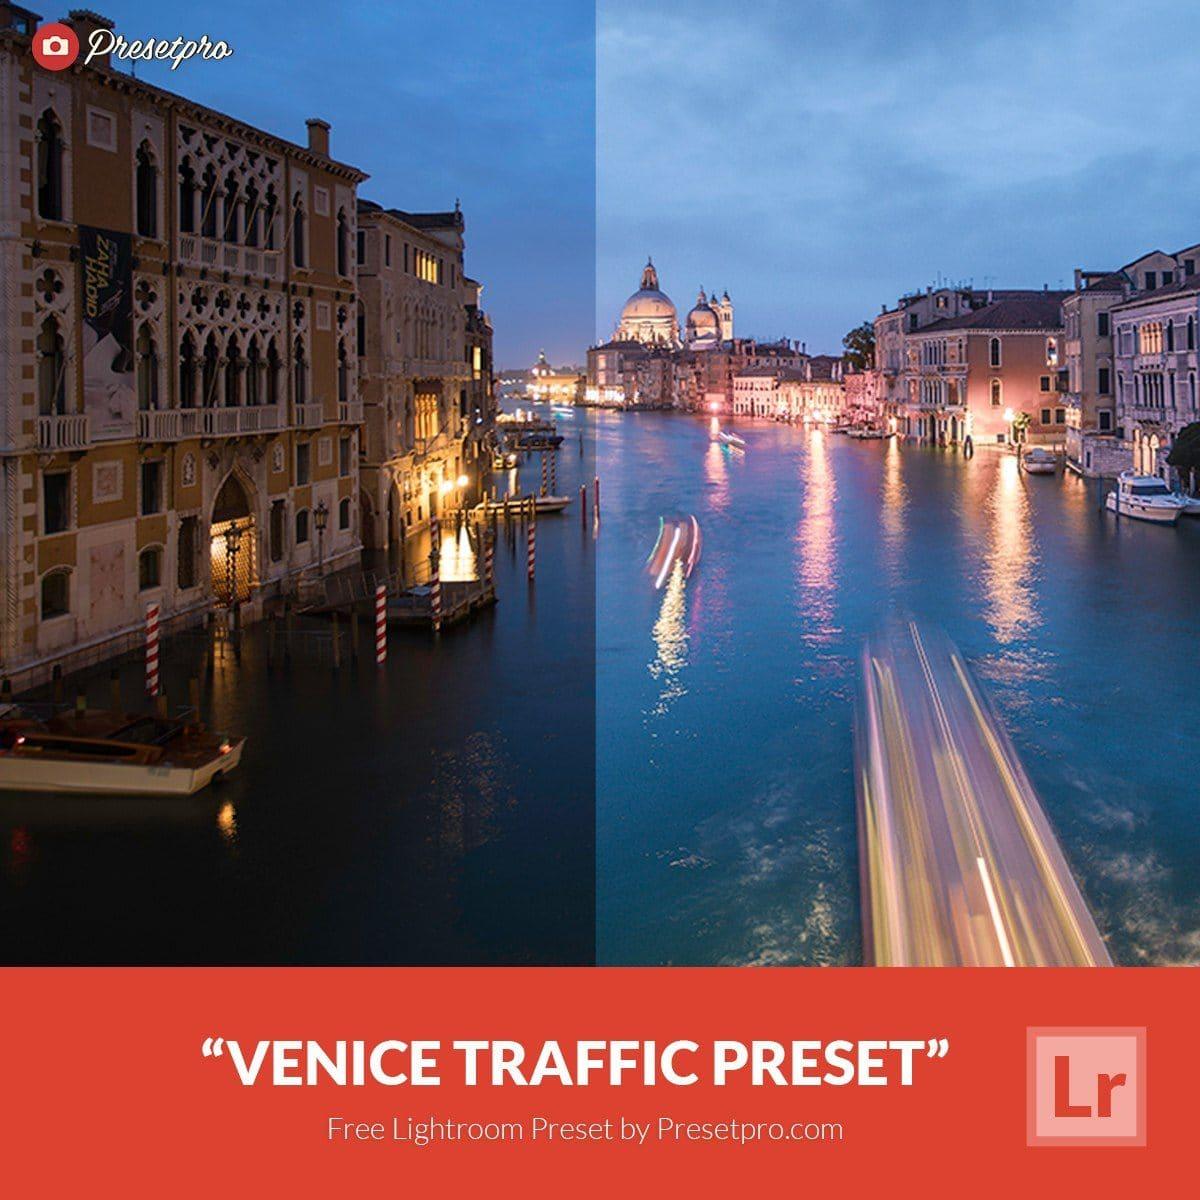 Free-Lightroom-Preset-Venice-Traffic-2